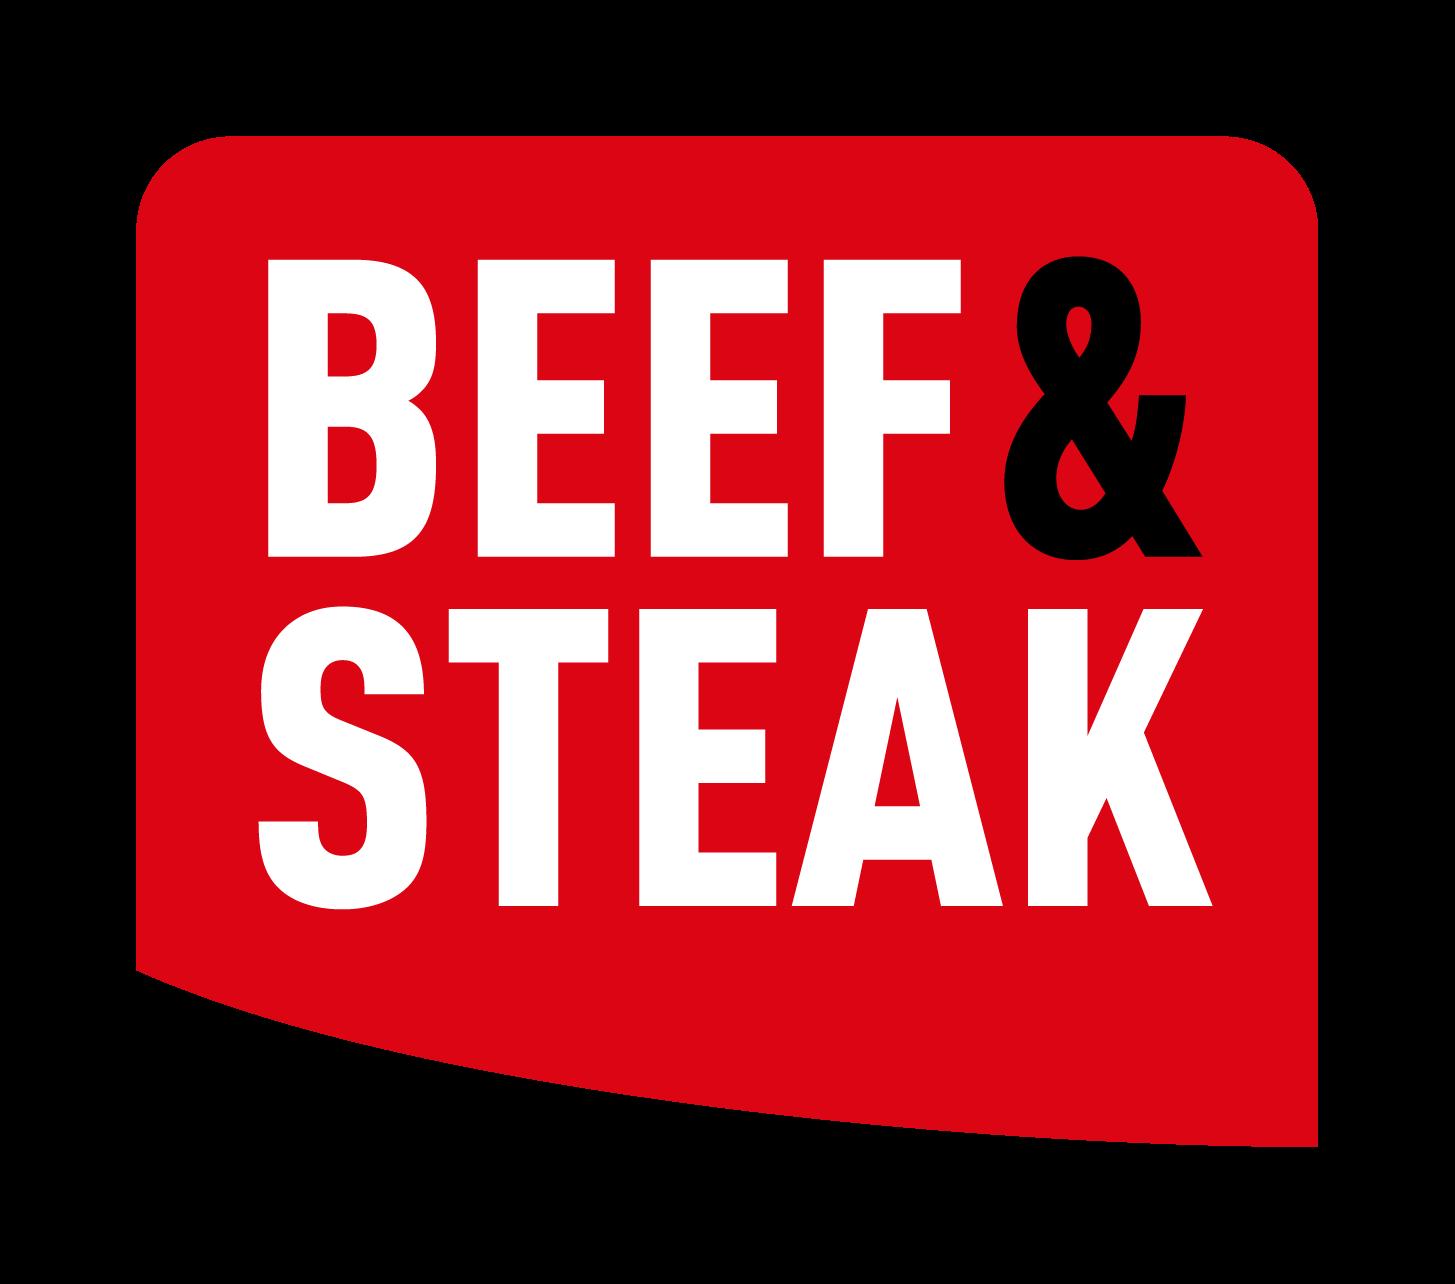 petromax-onderhoudswax